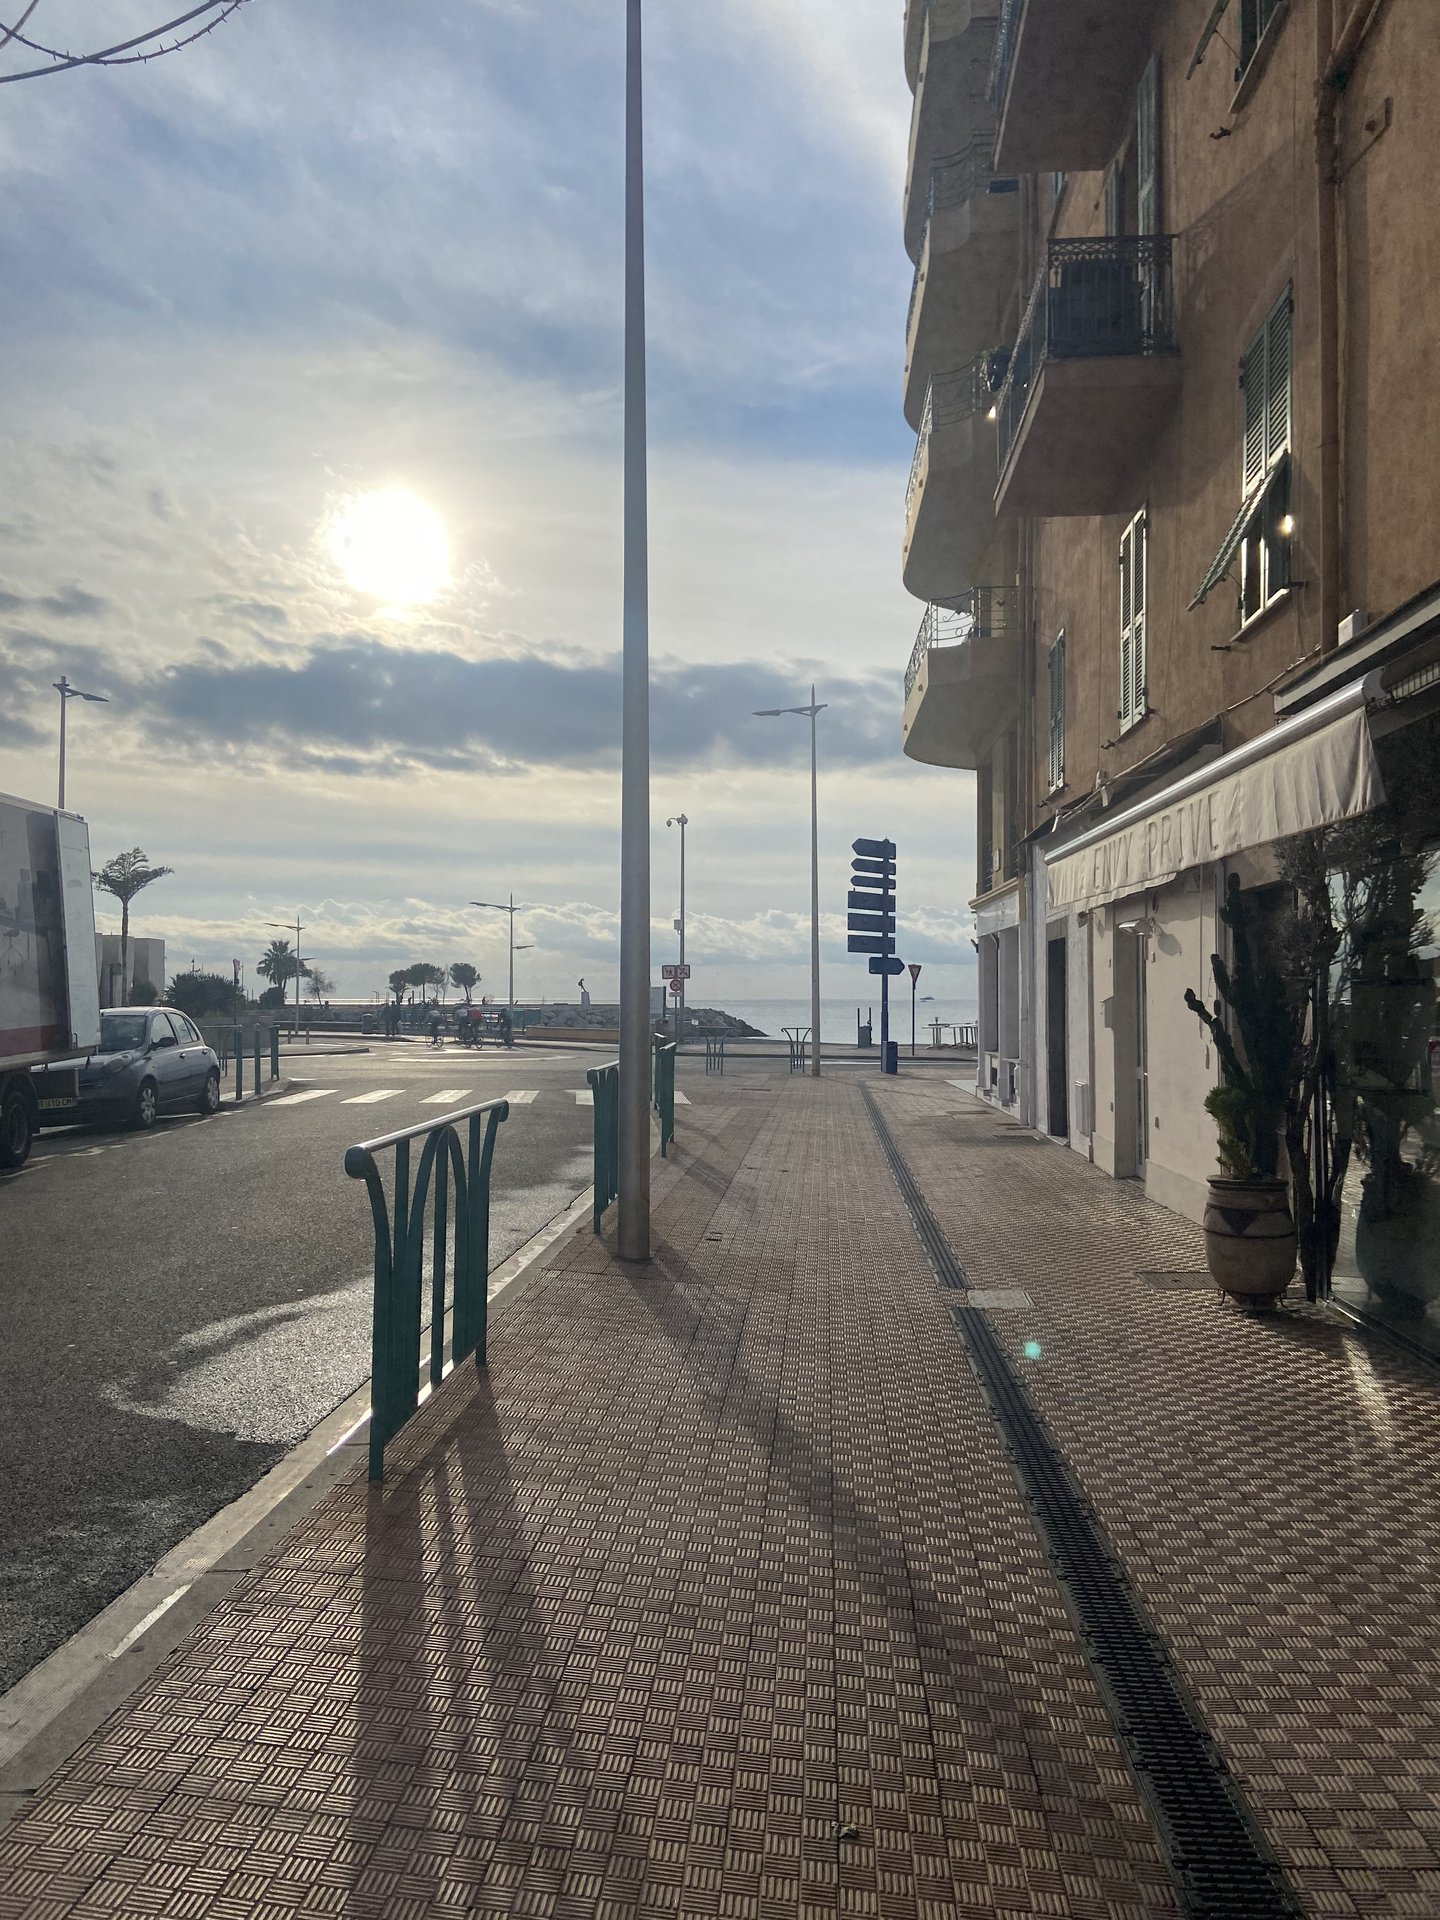 Vendita Buona entrata - Mentone (Menton) Piétonne